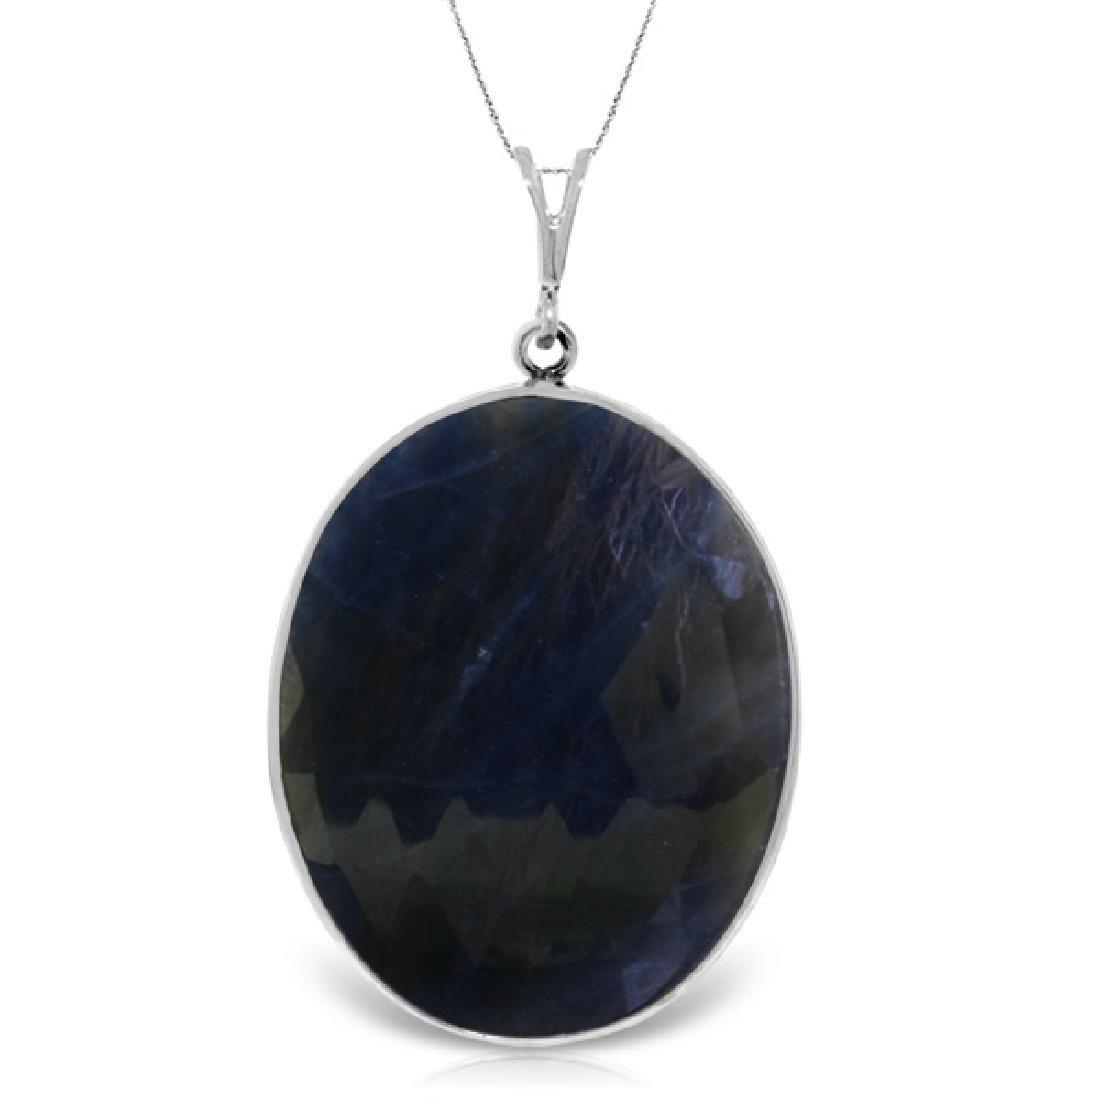 Genuine 20 ctw Sapphire Necklace Jewelry 14KT White